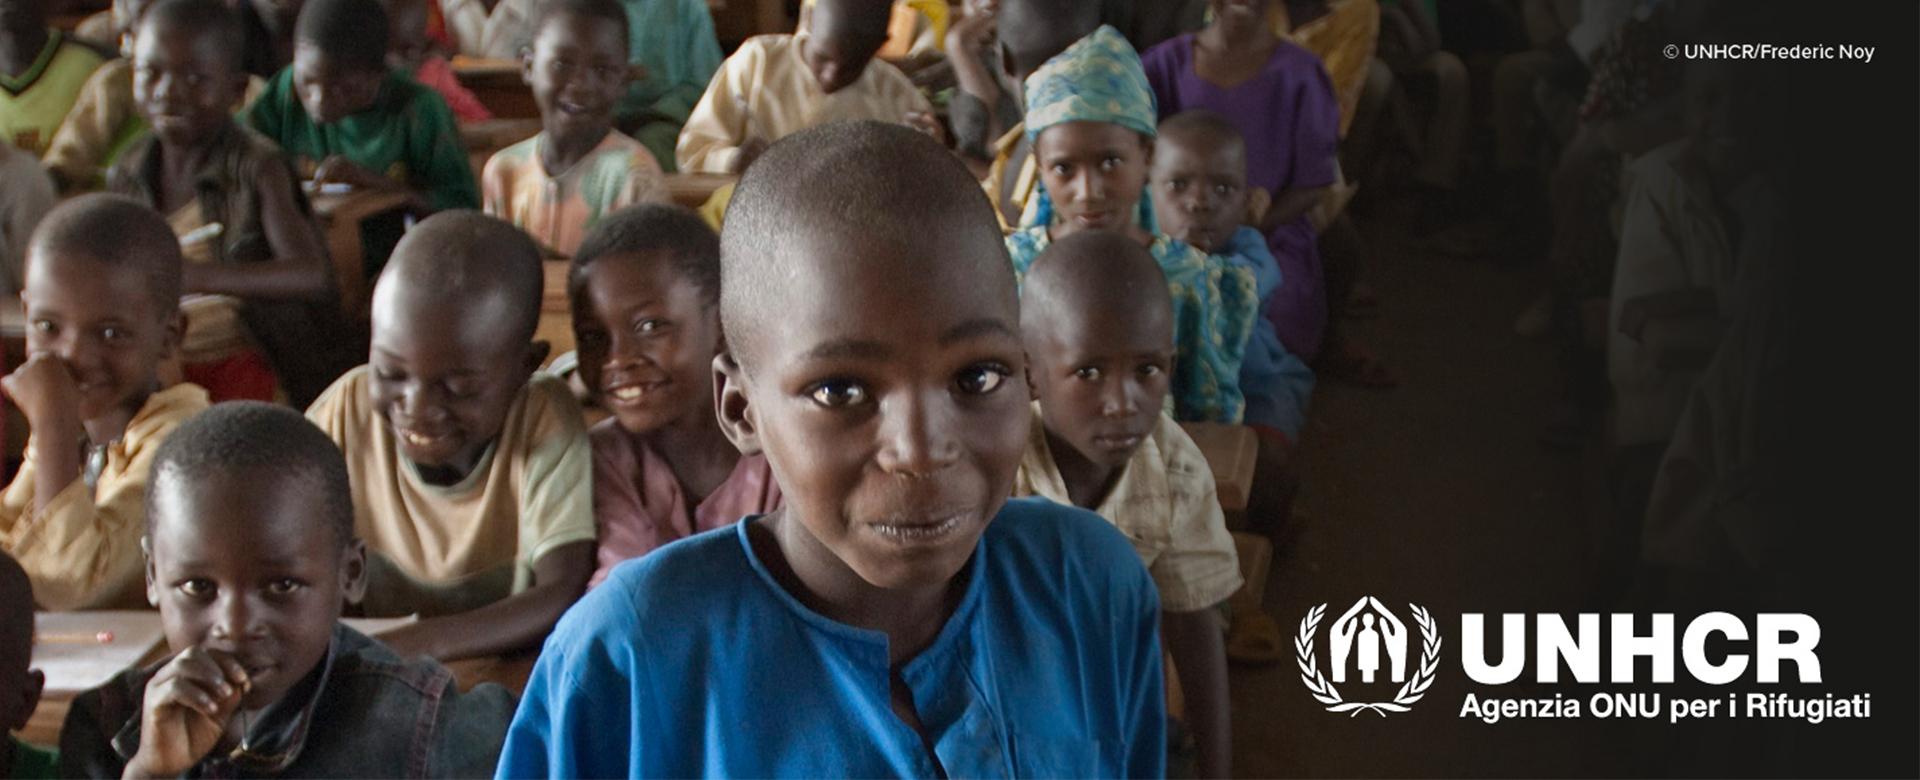 UNHCR_banner